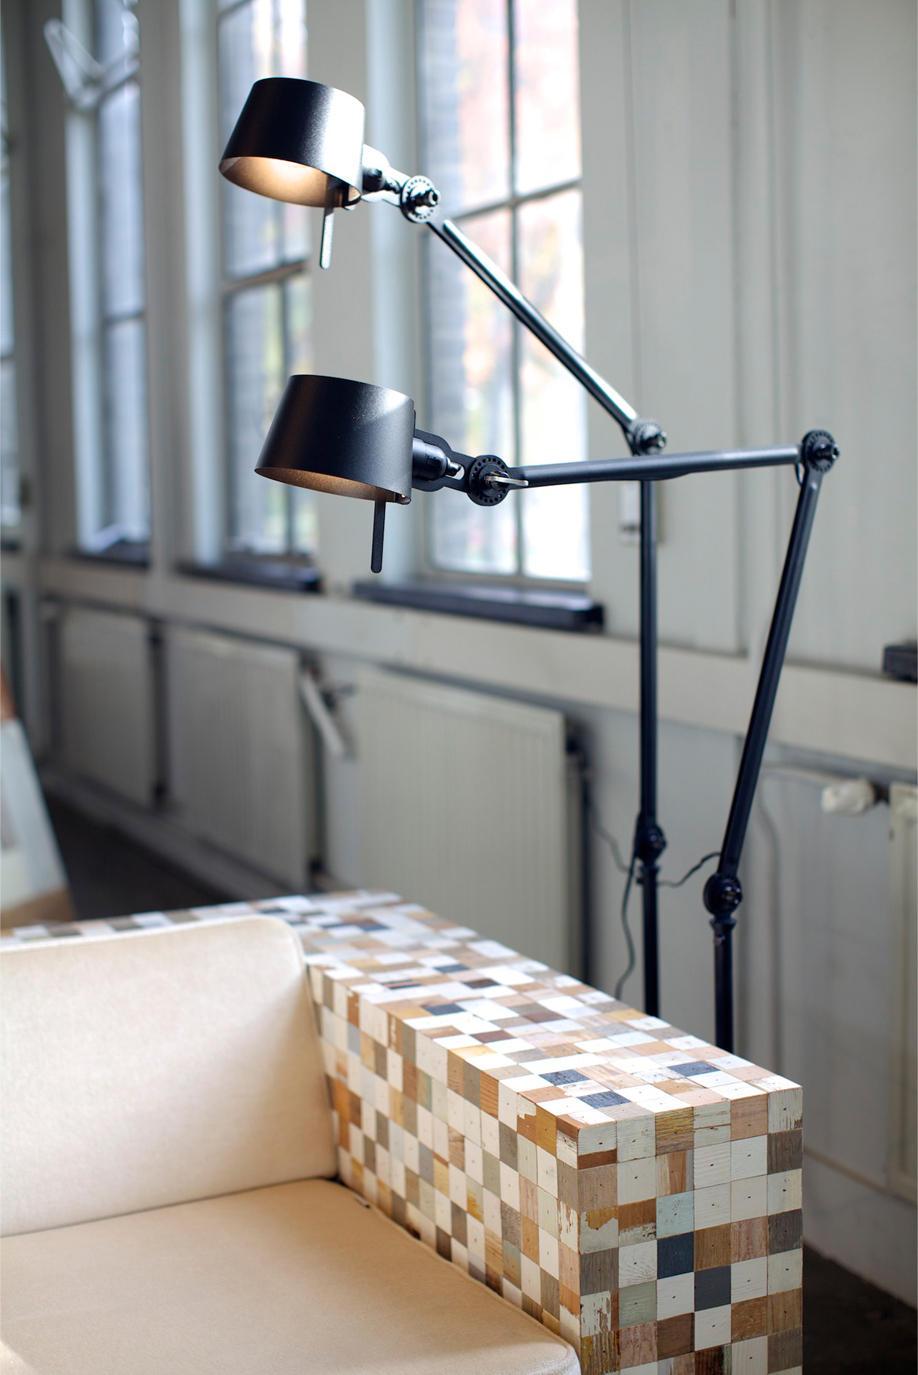 Bolt floor lamp single arm general lighting from tonone architonic bolt floor lamp single arm by tonone audiocablefo